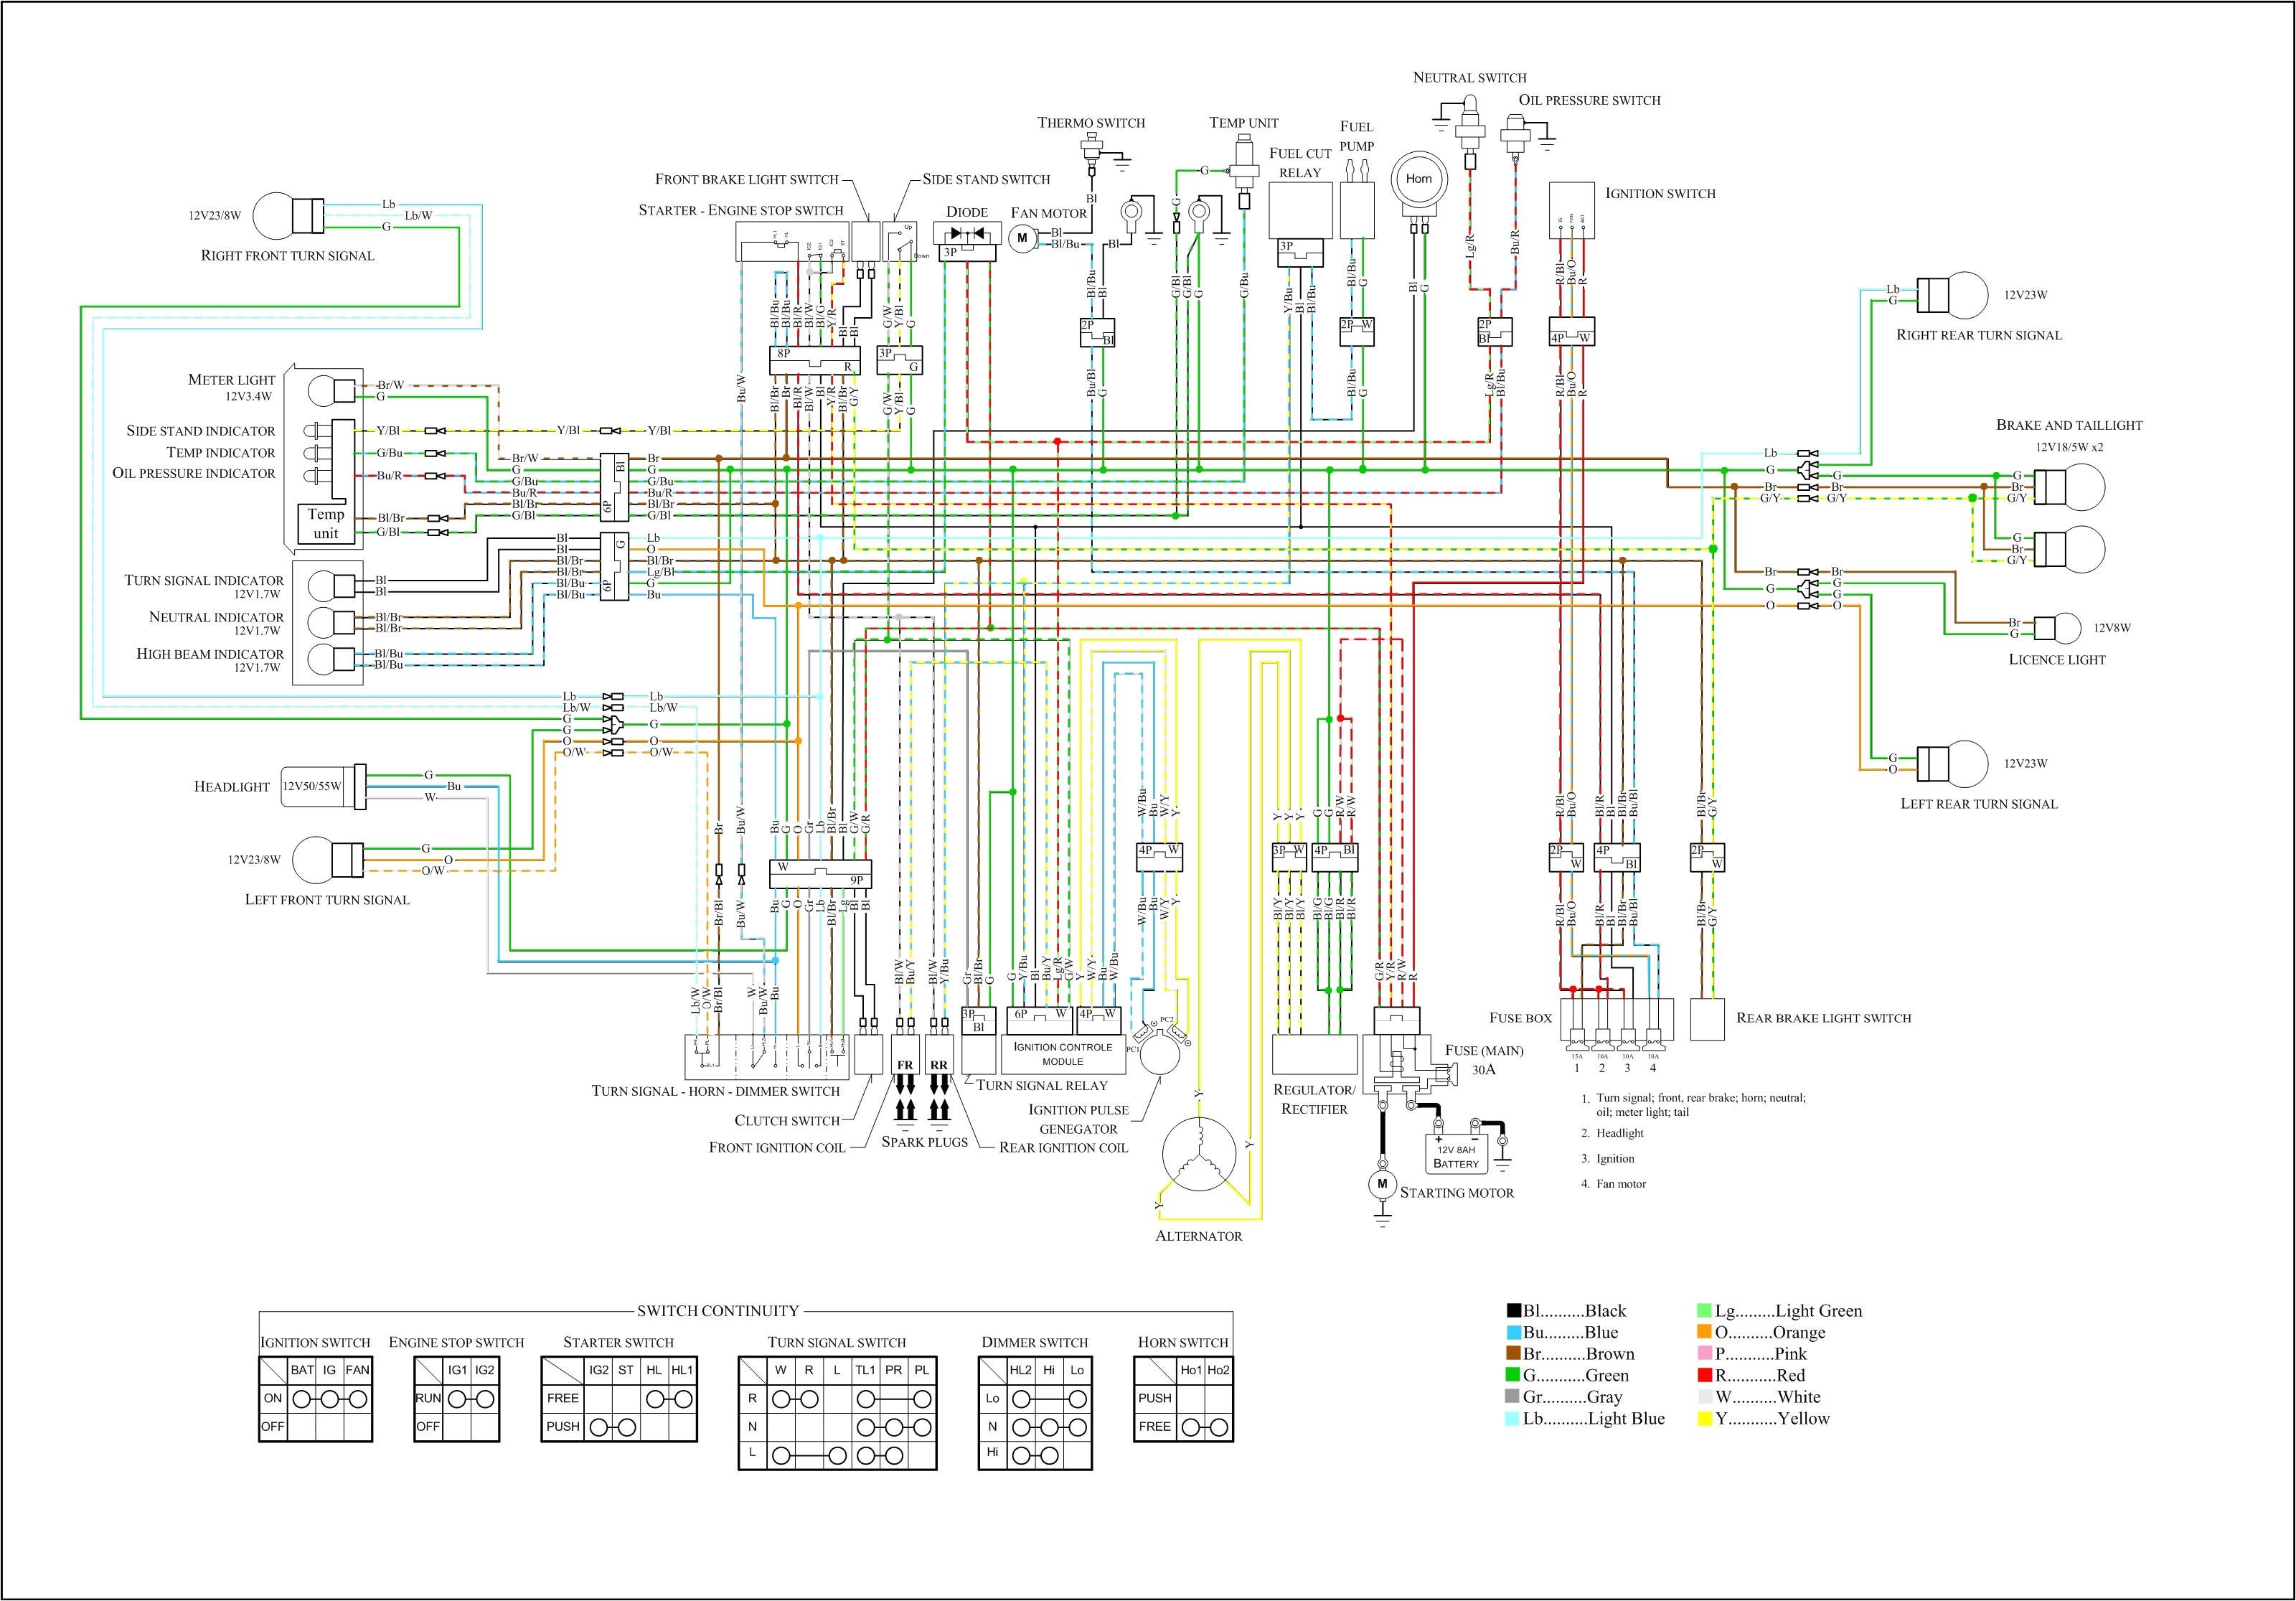 honda wave wiring diagram wiring diagram centre1975camarowiringdiagram honda vt1100c shadow 1100 1995 wiringvt1100c2 wiring diagram wiring